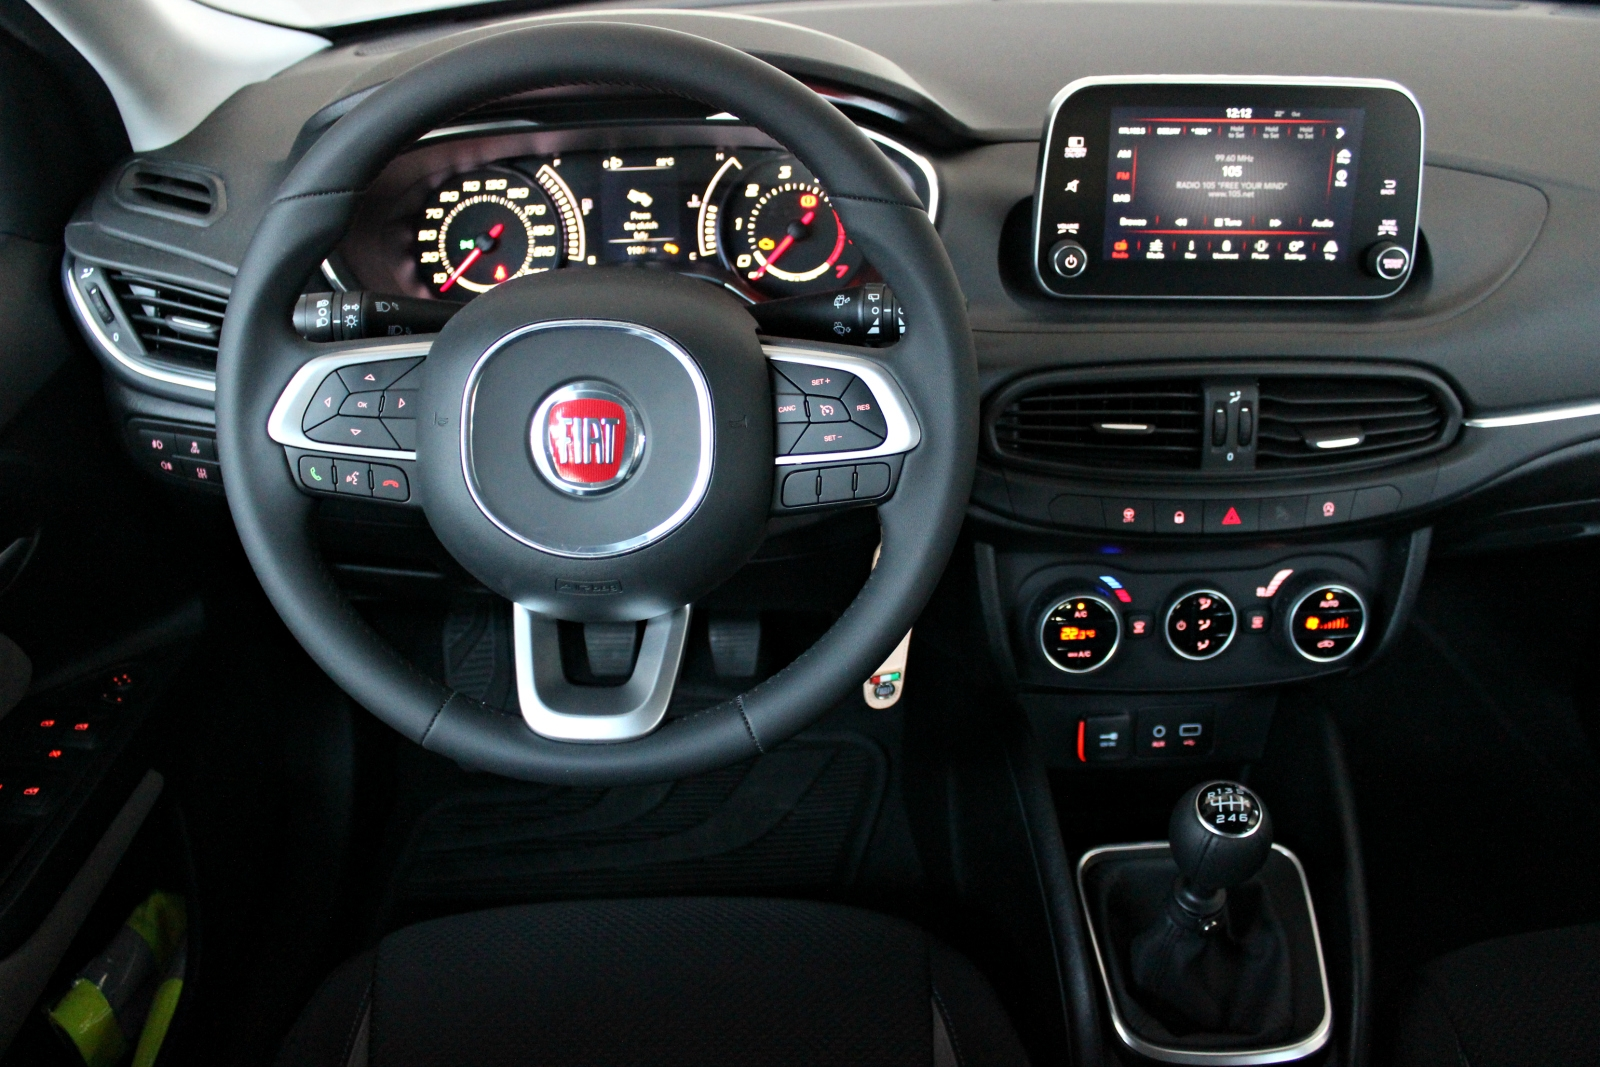 Essai vid o fiat tipo 5 portes la vraie voiture essentielle - Voiture 3 portes ou 5 portes ...